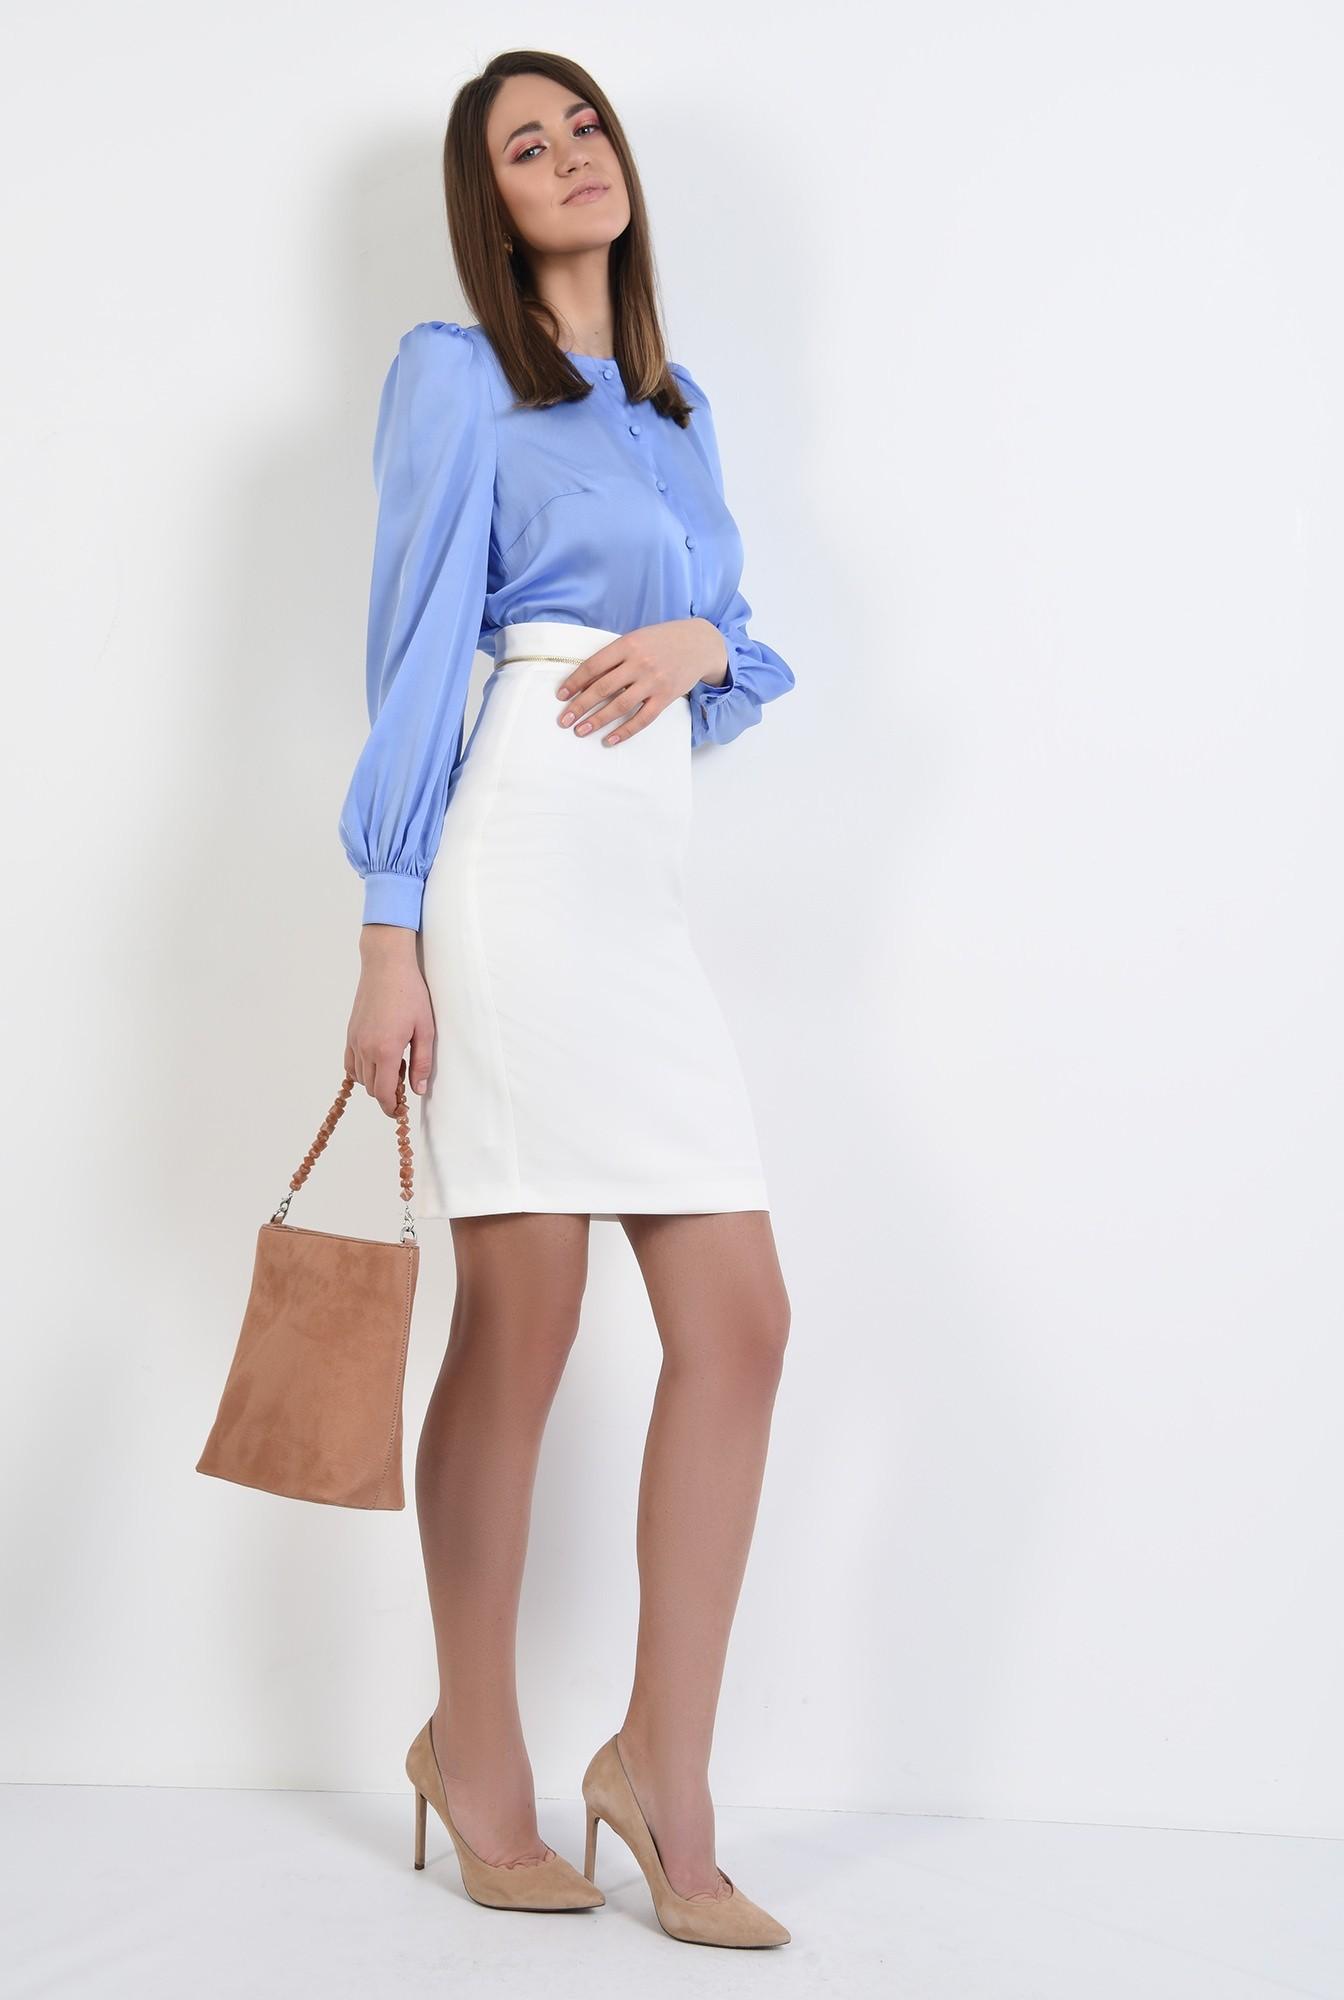 3 - bluza de primavara, office, cu nasturi, maneci lungi